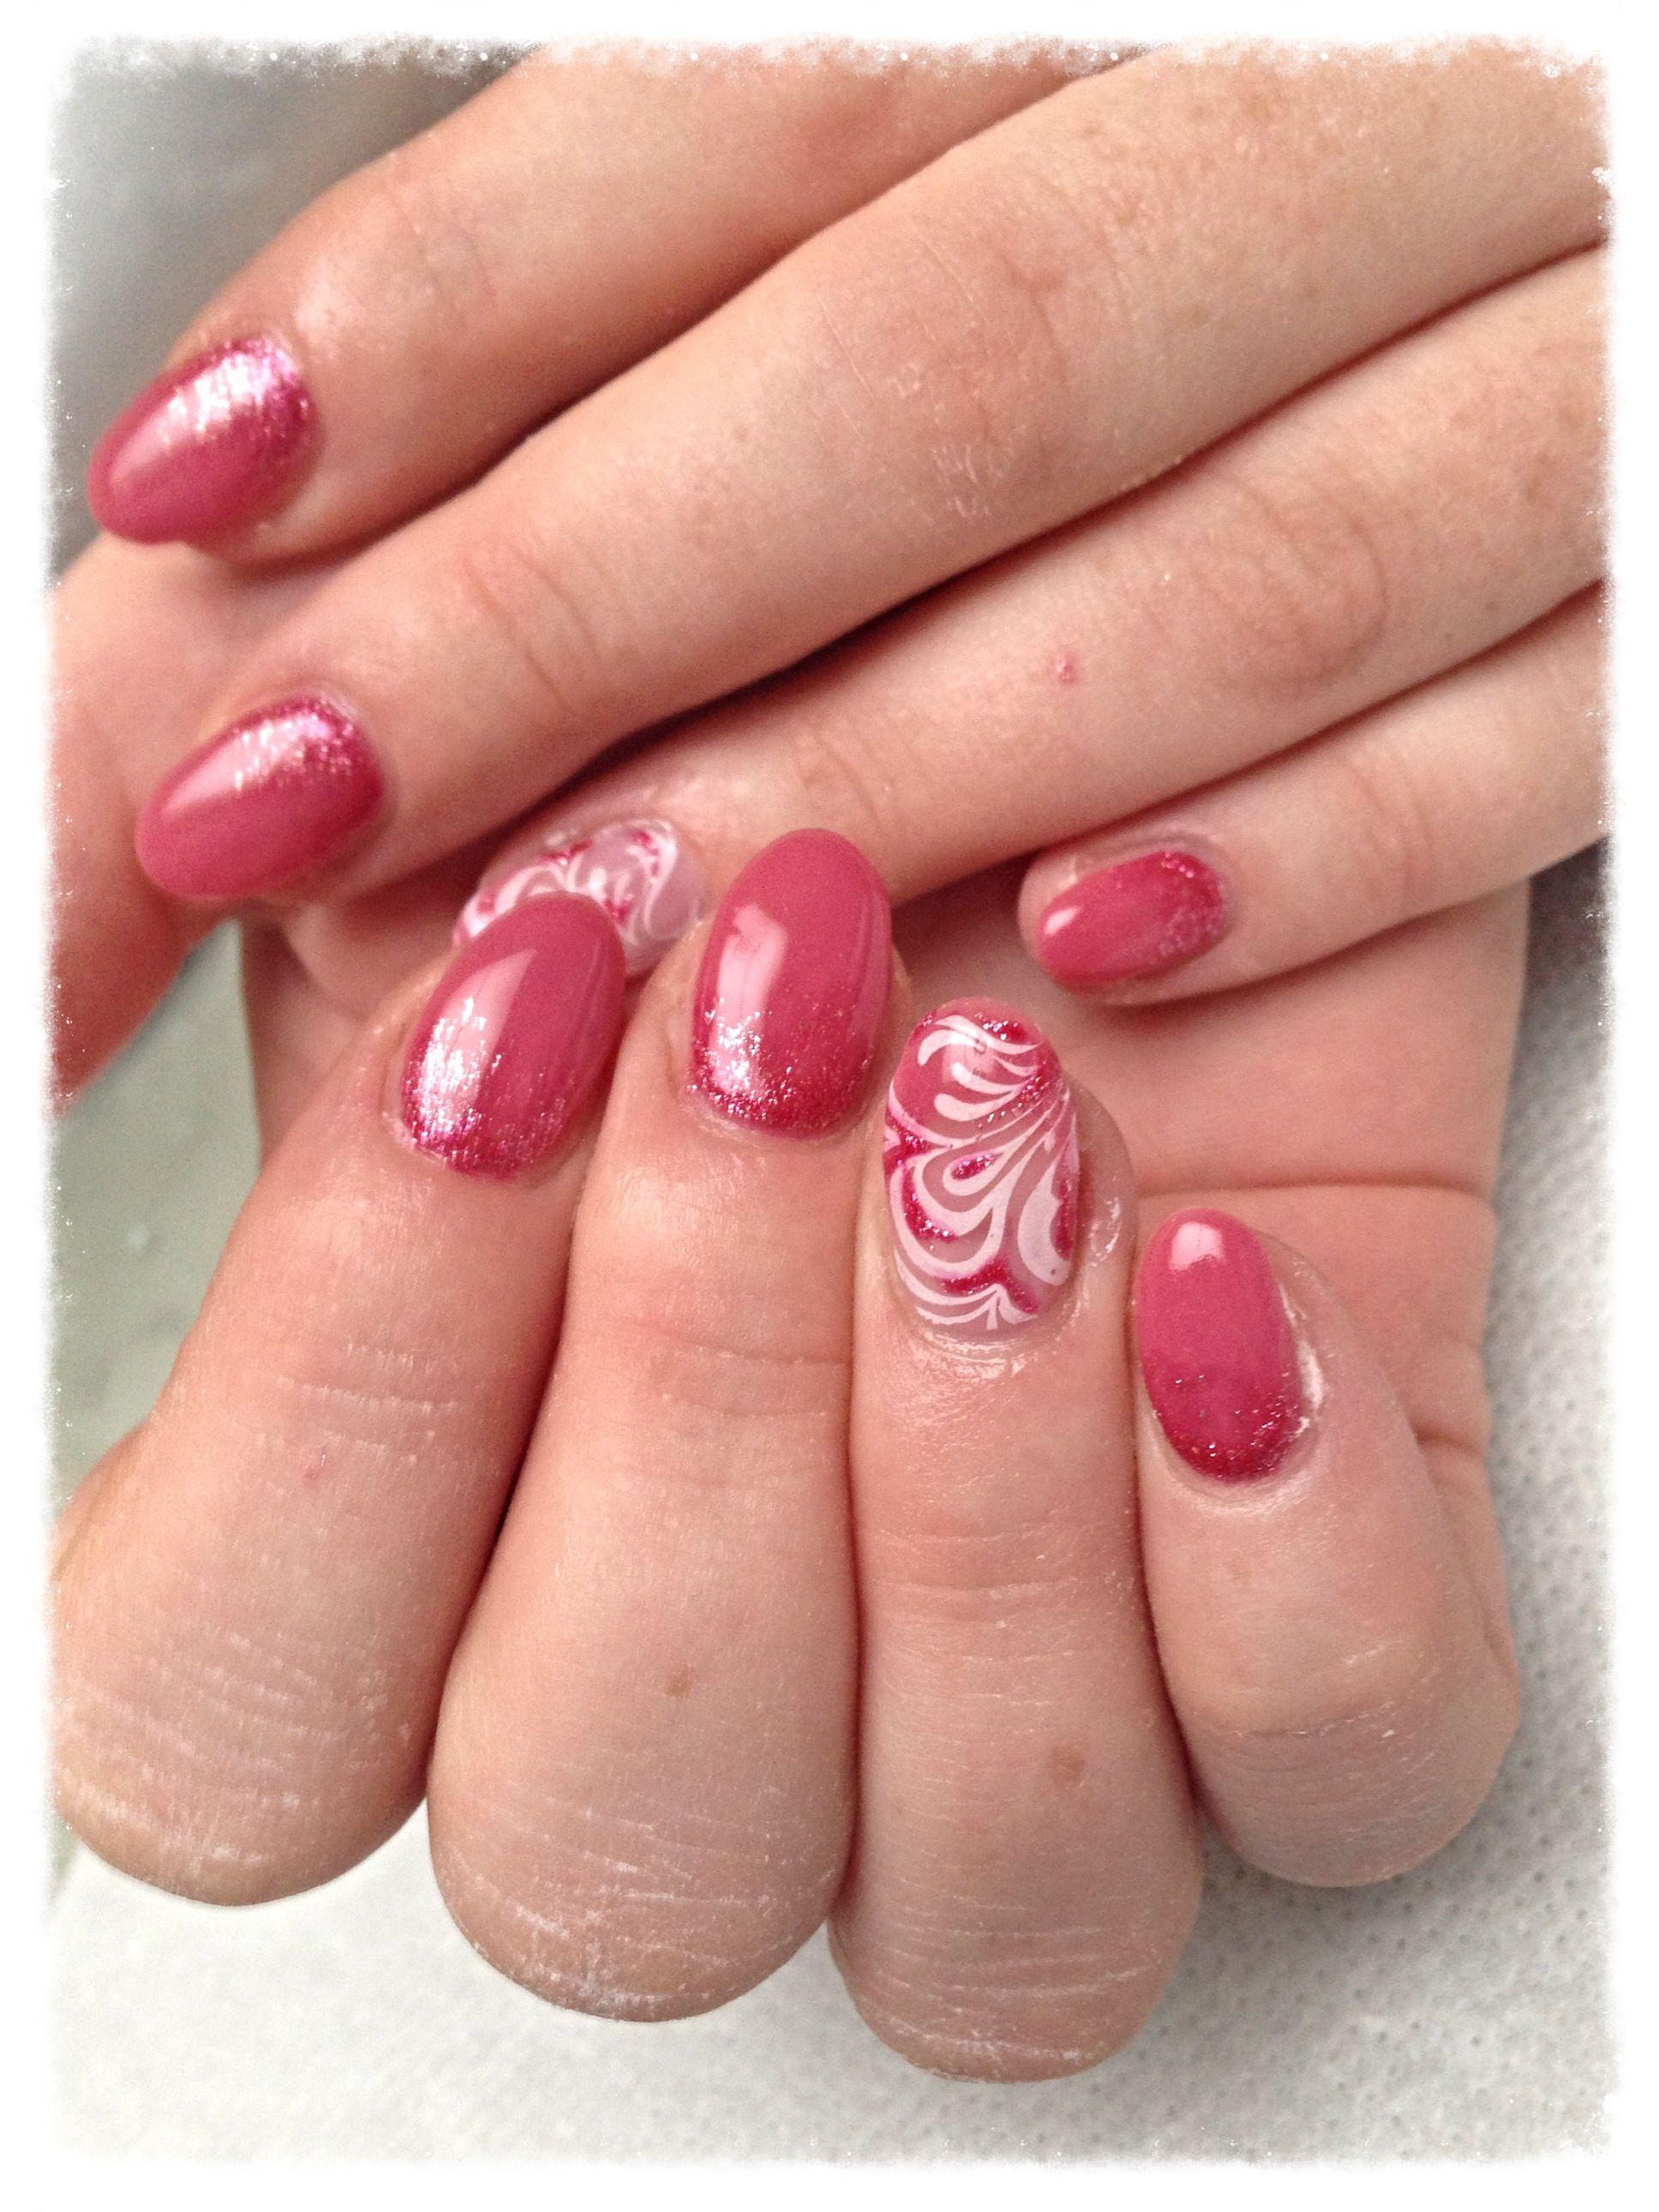 My work - Nagels, nail-art / my work | Pinterest